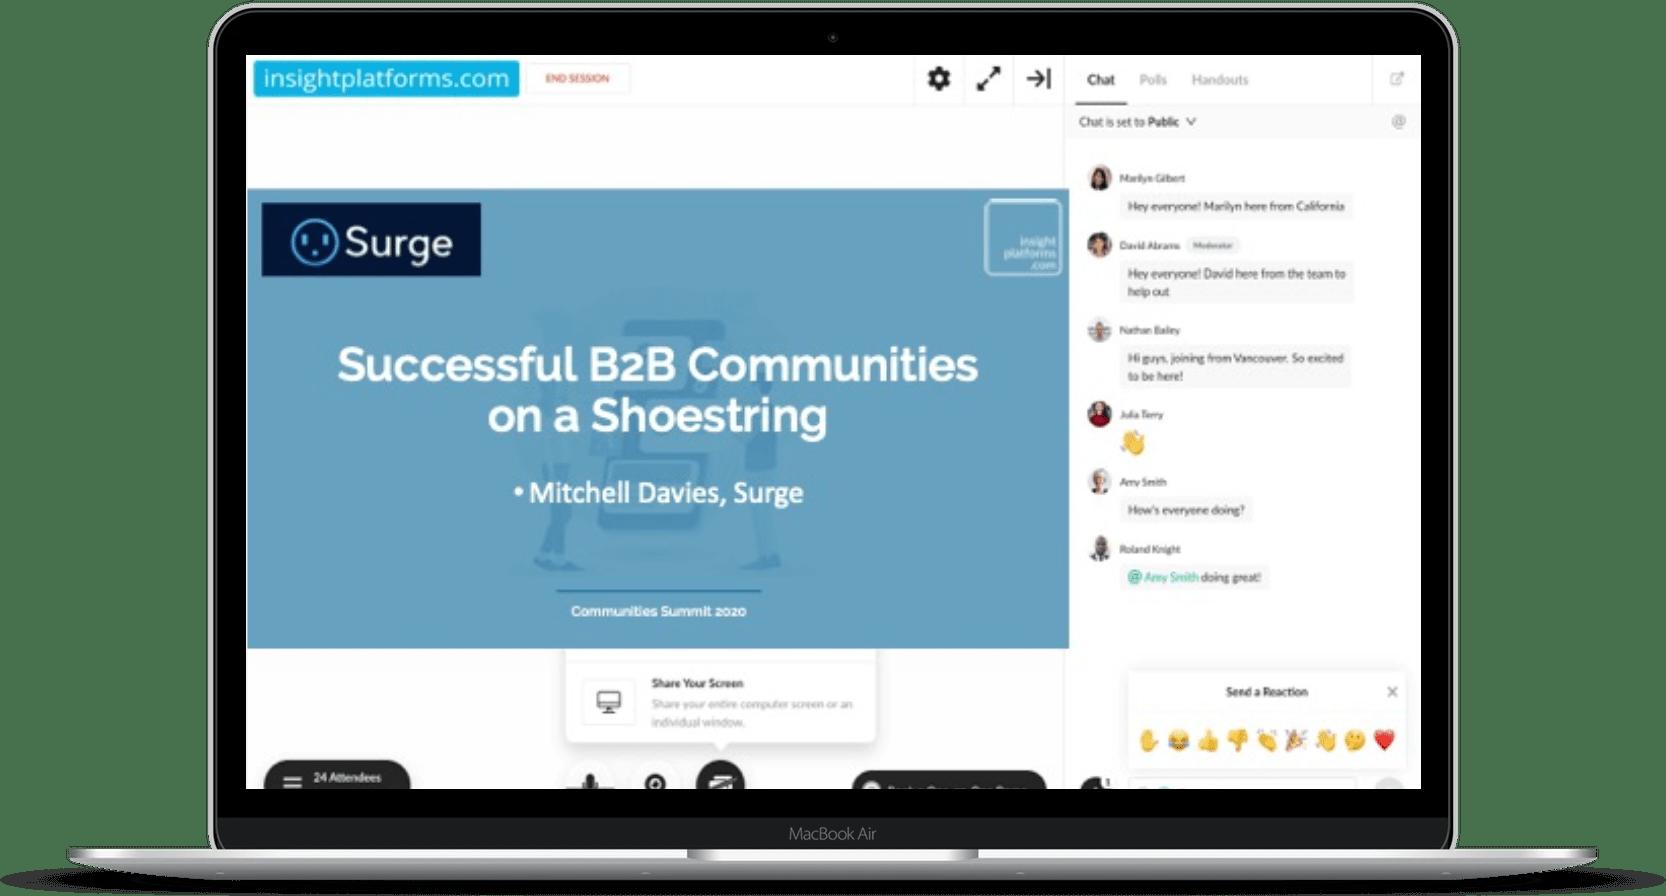 Communities Summit Webinar Room - Insight Platforms